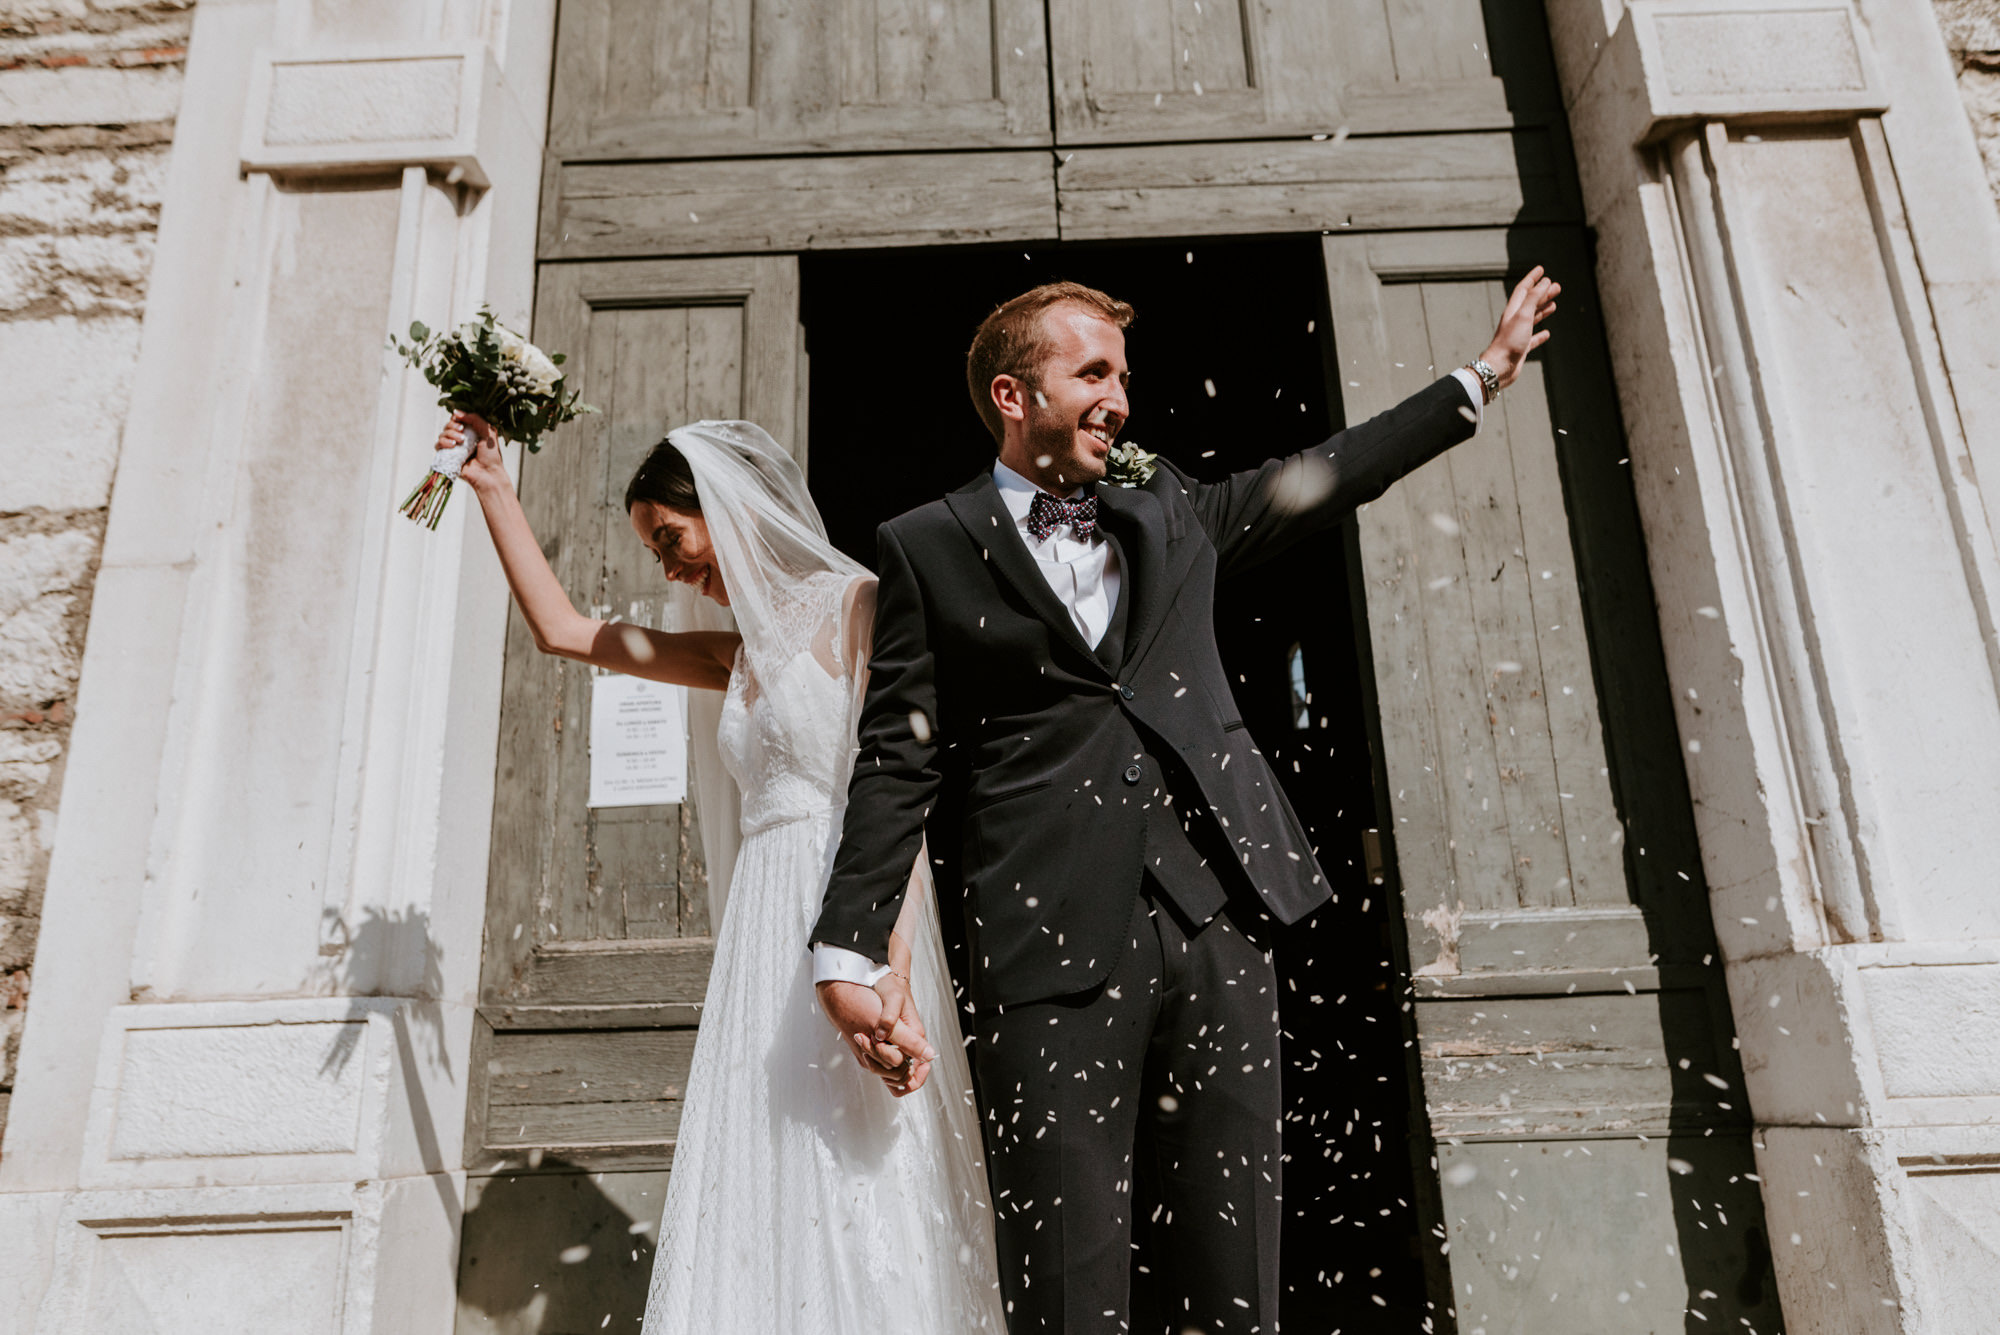 FOTO+PHOTO+BODA+WEDDING+ITALIA+ITALY+MAURICIO+GARAY+MAURICIOGARAY+WEDDINPHOTOGRAPHER+FOTOGRAFODEBODA-1057.jpg